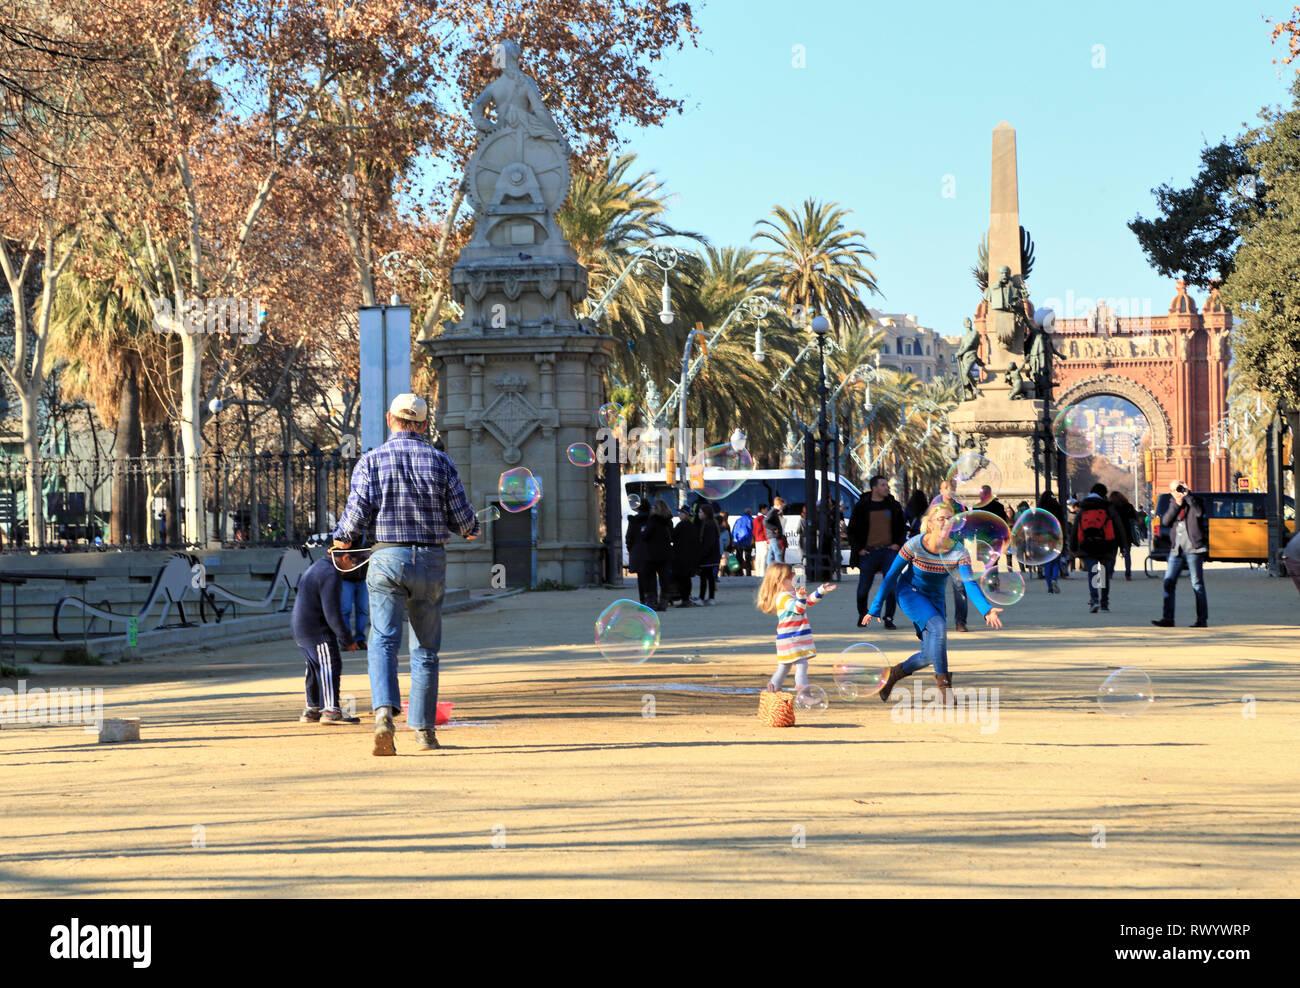 Soap bubble street artist performance, Arco de Triunfo, Passeig de Lluís Companys, Parc de la Ciutadella, Barcelona - Stock Image